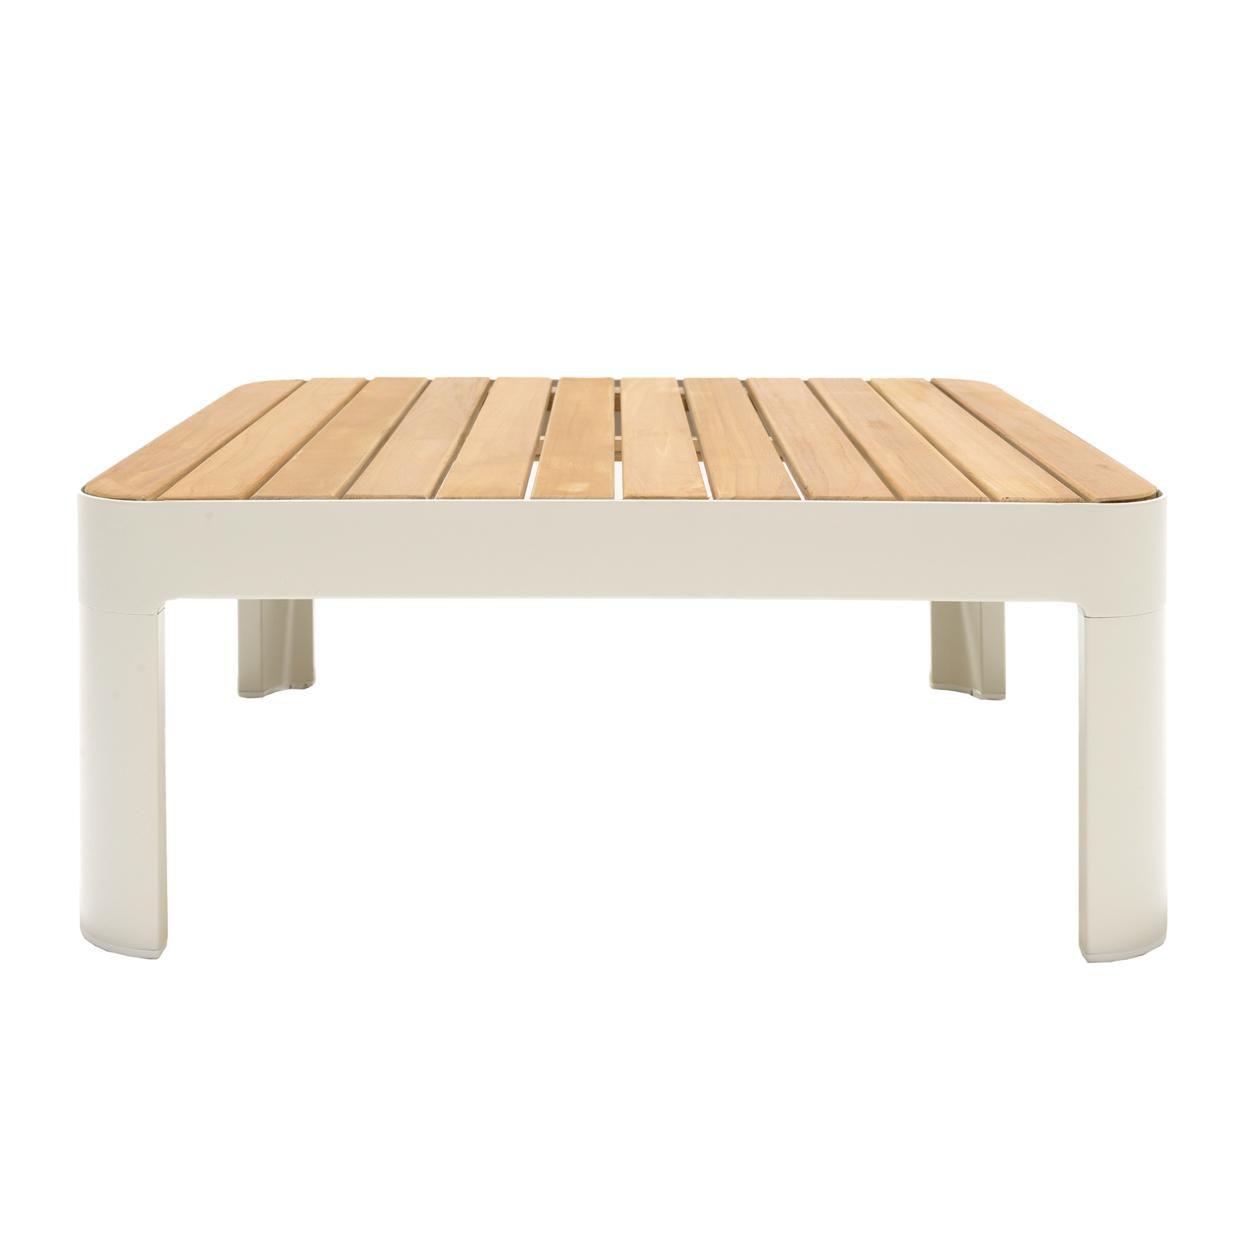 Saltoro Sherpi Outdoor Sofa with Slatted Snack tray, Set of 2, Light Gray